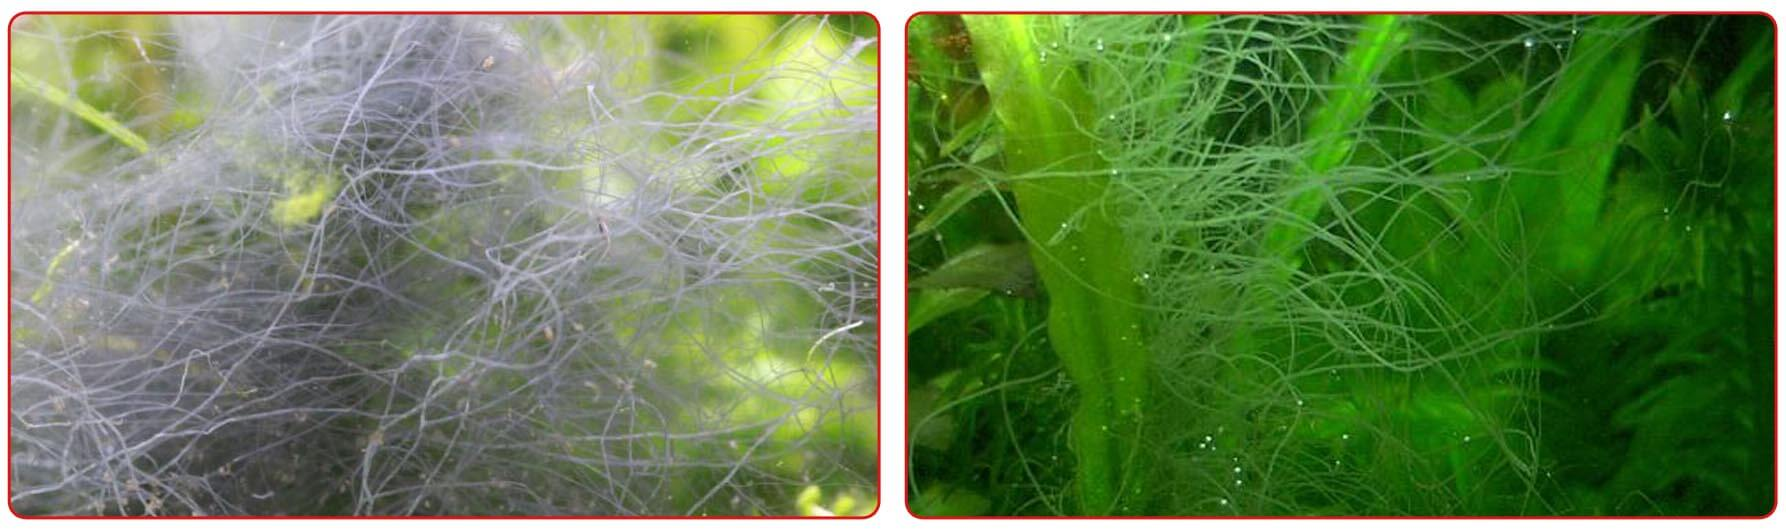 Олений рог на растениях в аквариуме